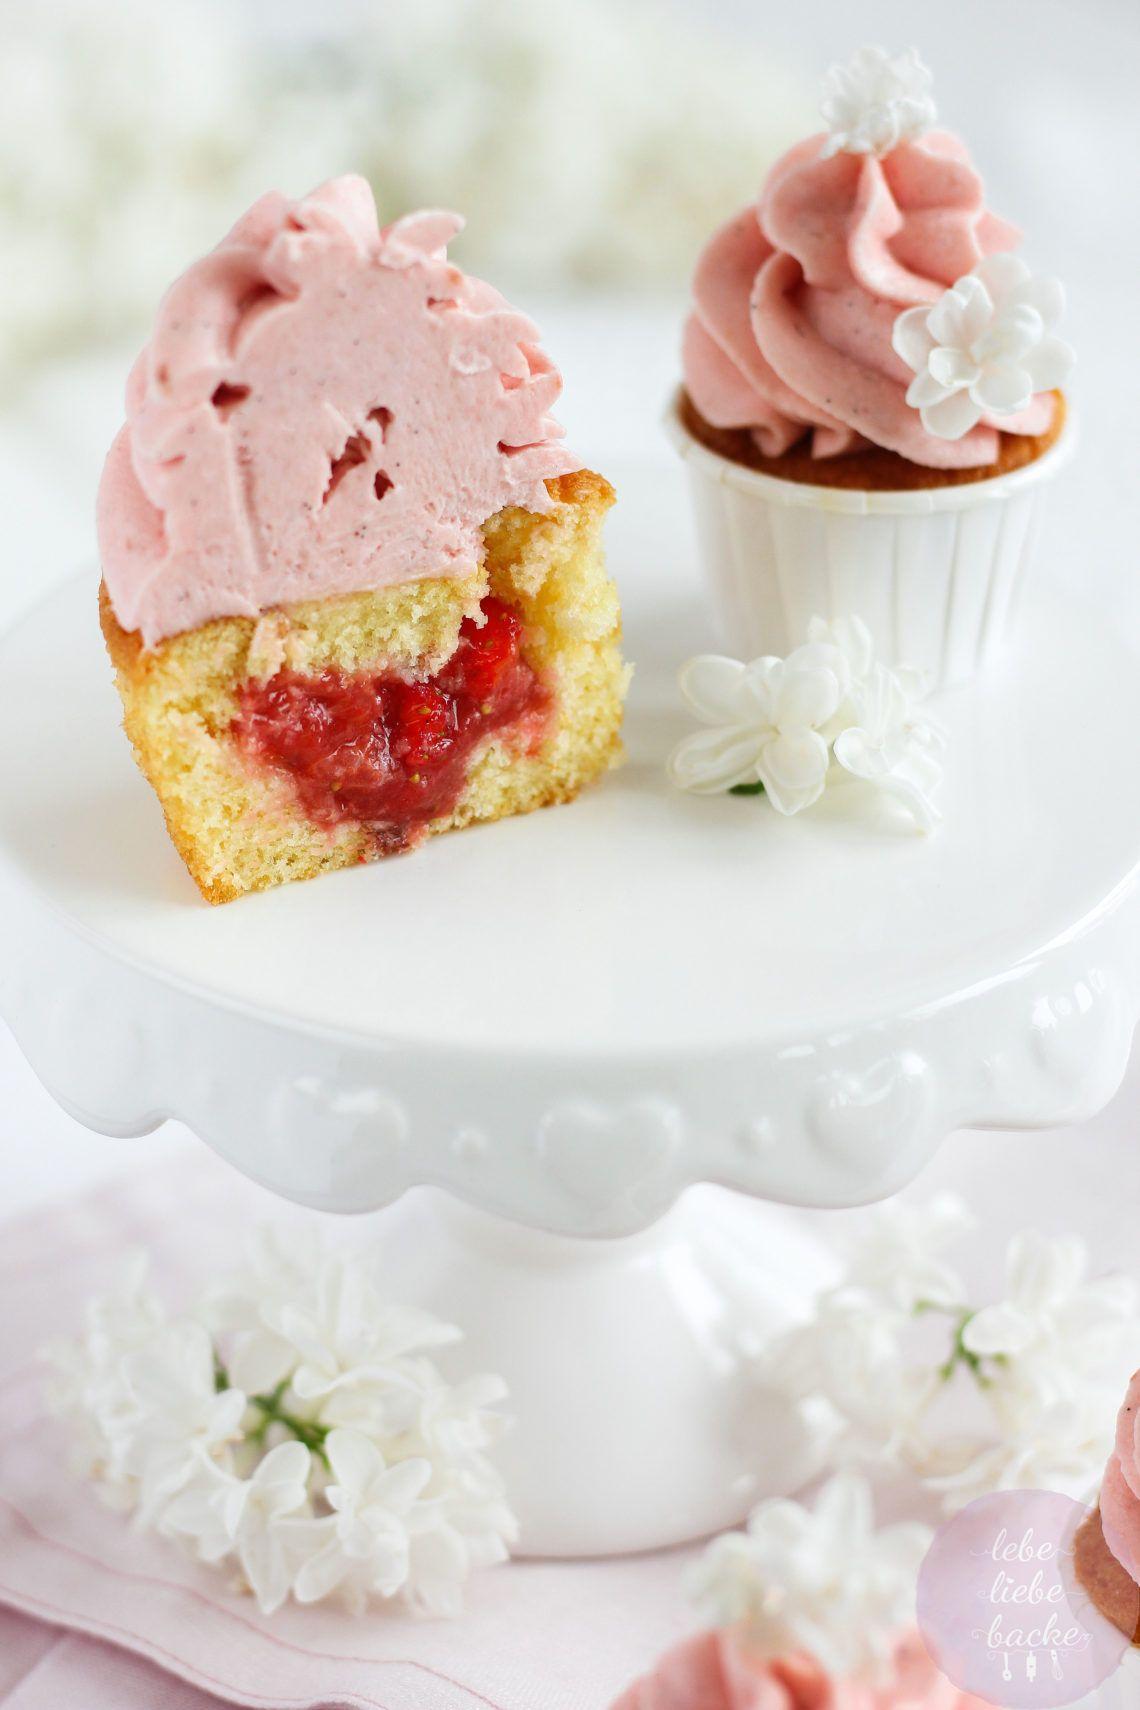 Erdbeer-Rhabarber Cupcakes - lebe liebe backe